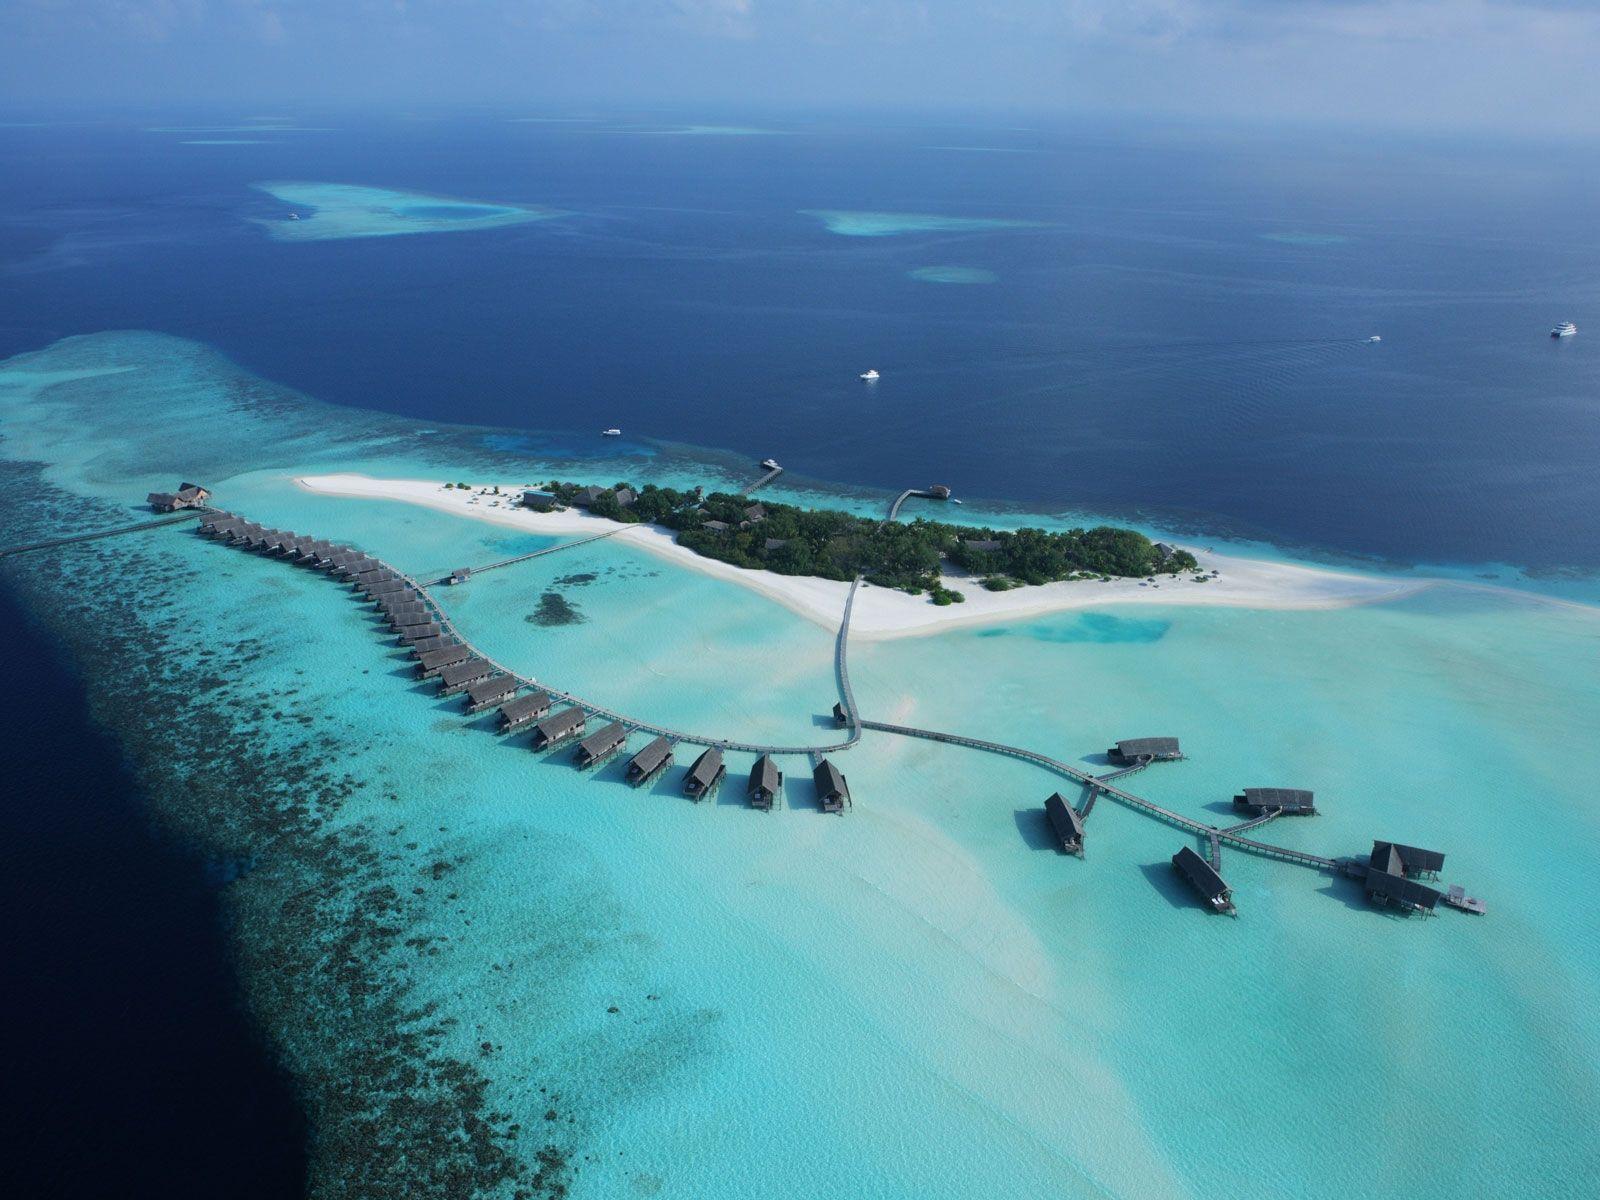 48 hoteles de ensueño épicas para visitar antes de morir - Matador Network   Maldivas